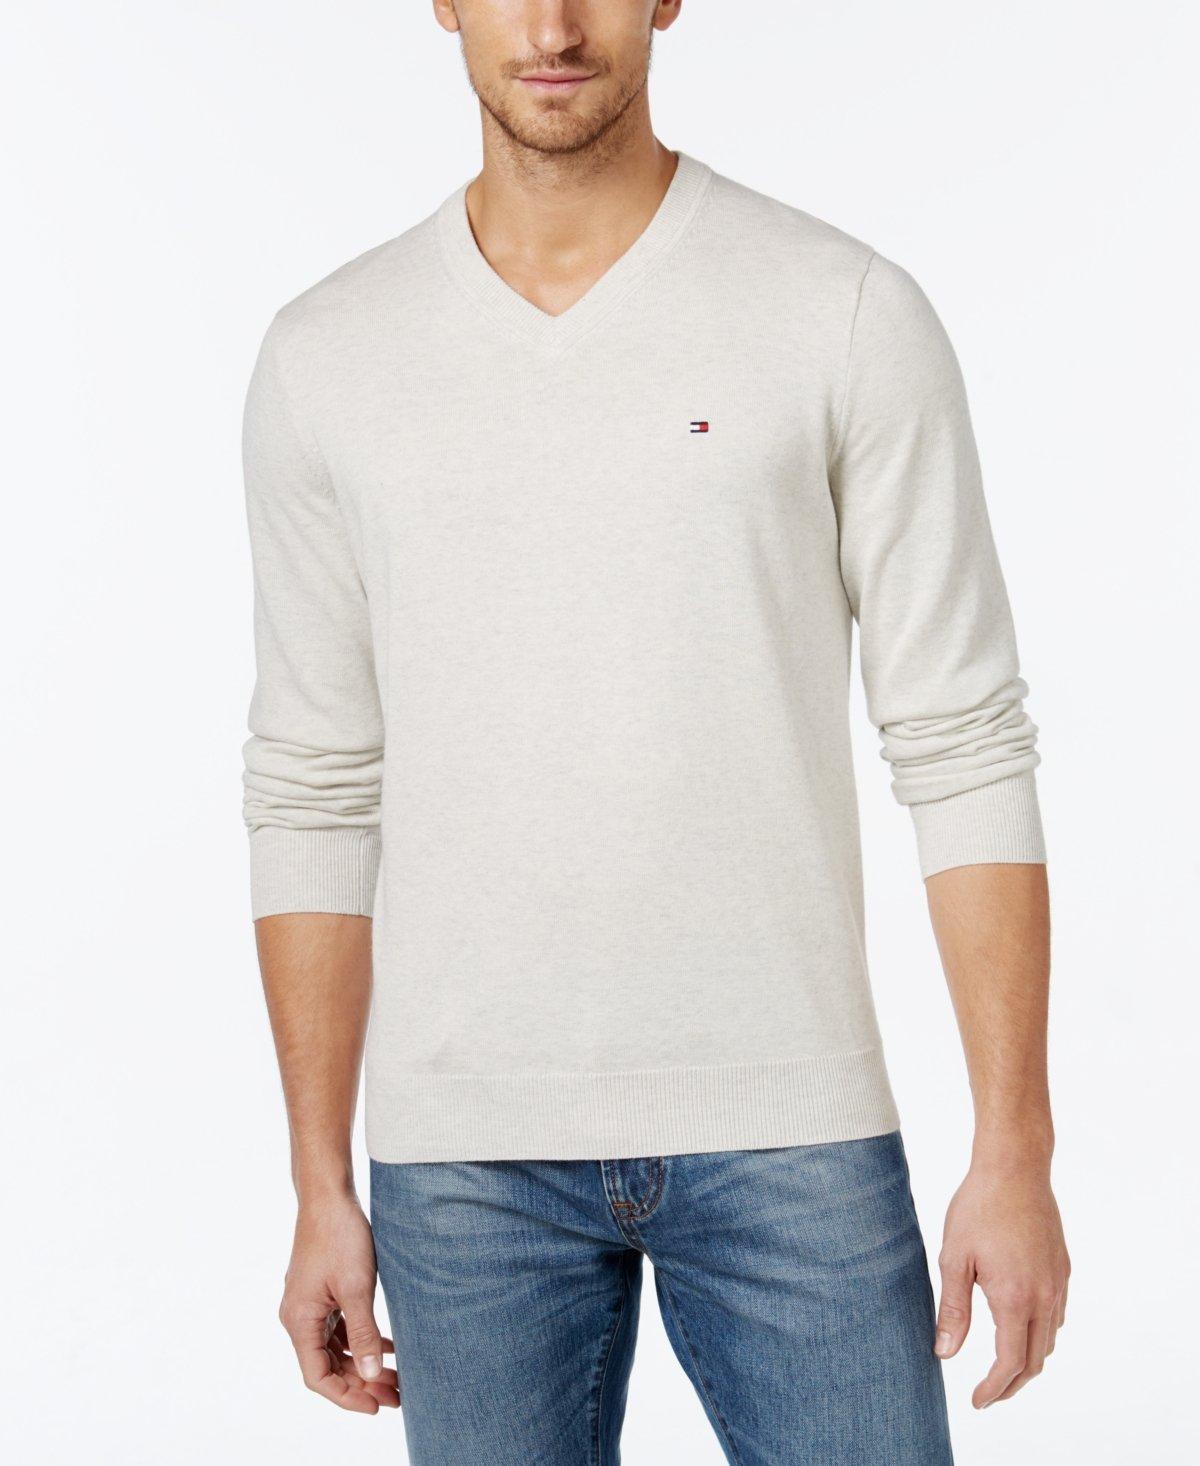 Tommy Hilfiger Mens Premium Cotton V-Neck Sweater - XL - Ice Grey Heather